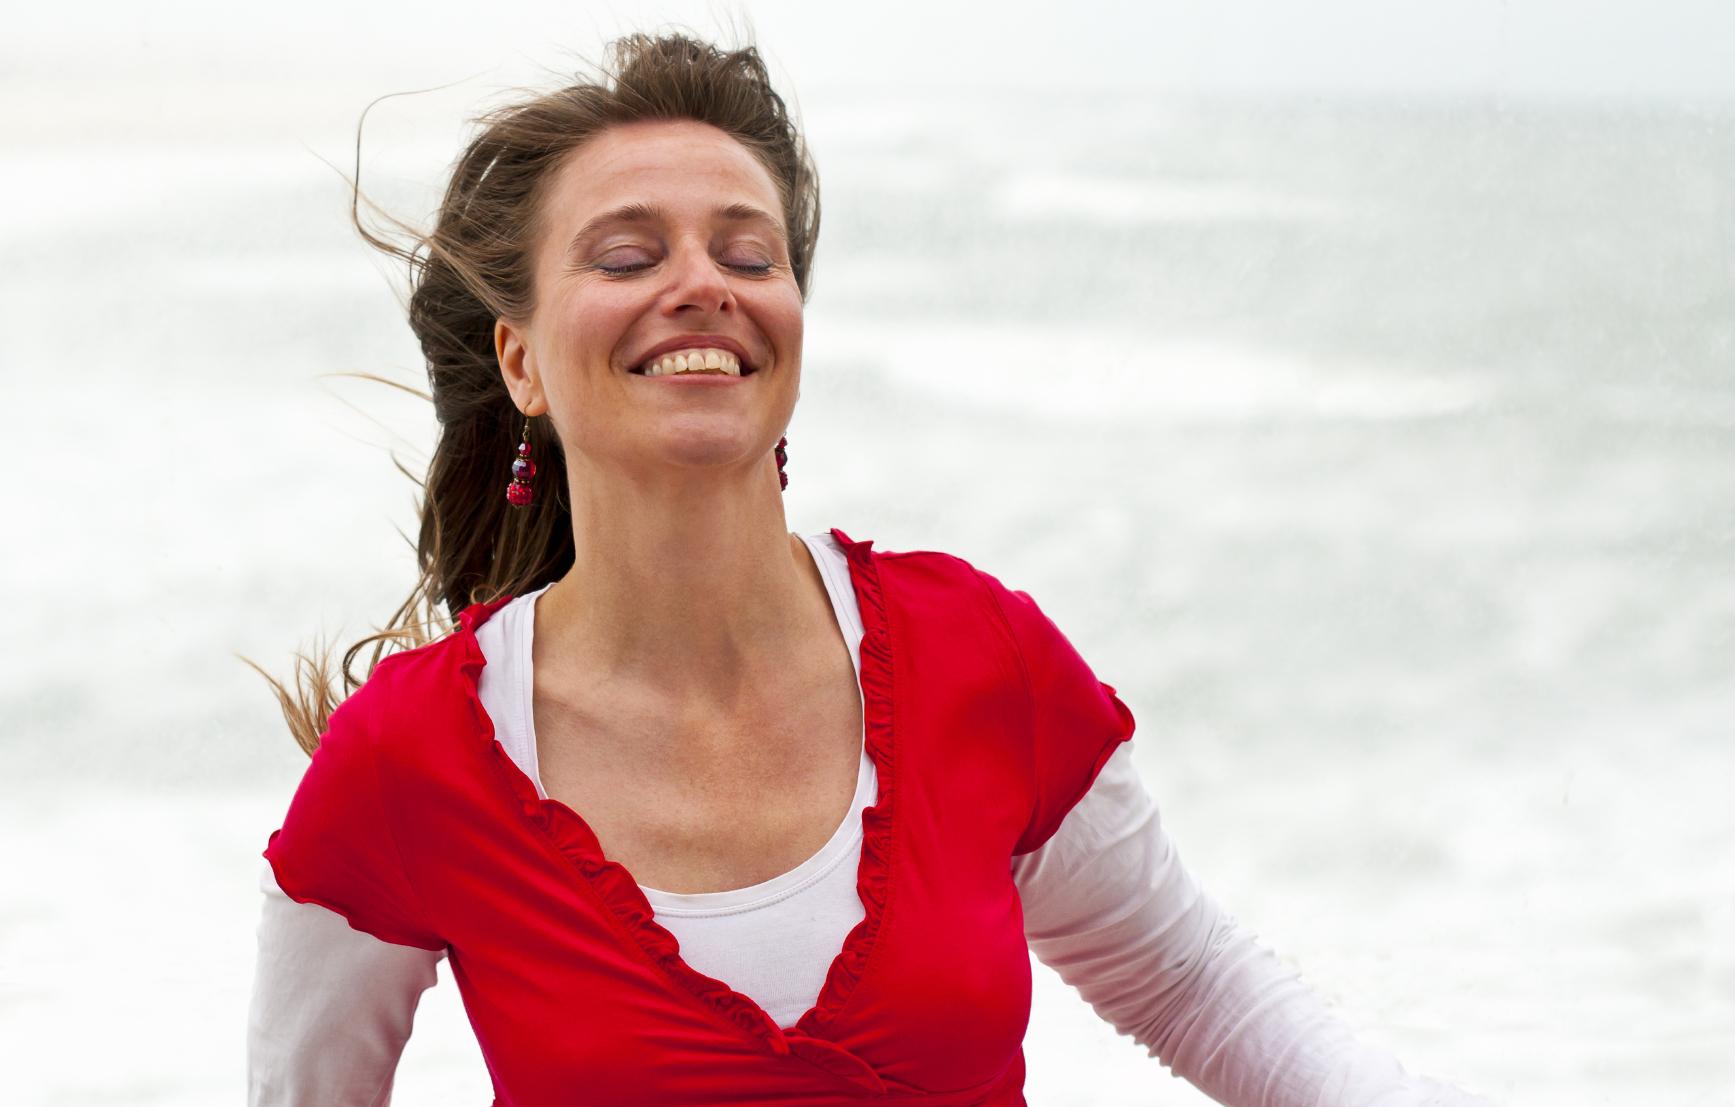 woman with bipolar disorder